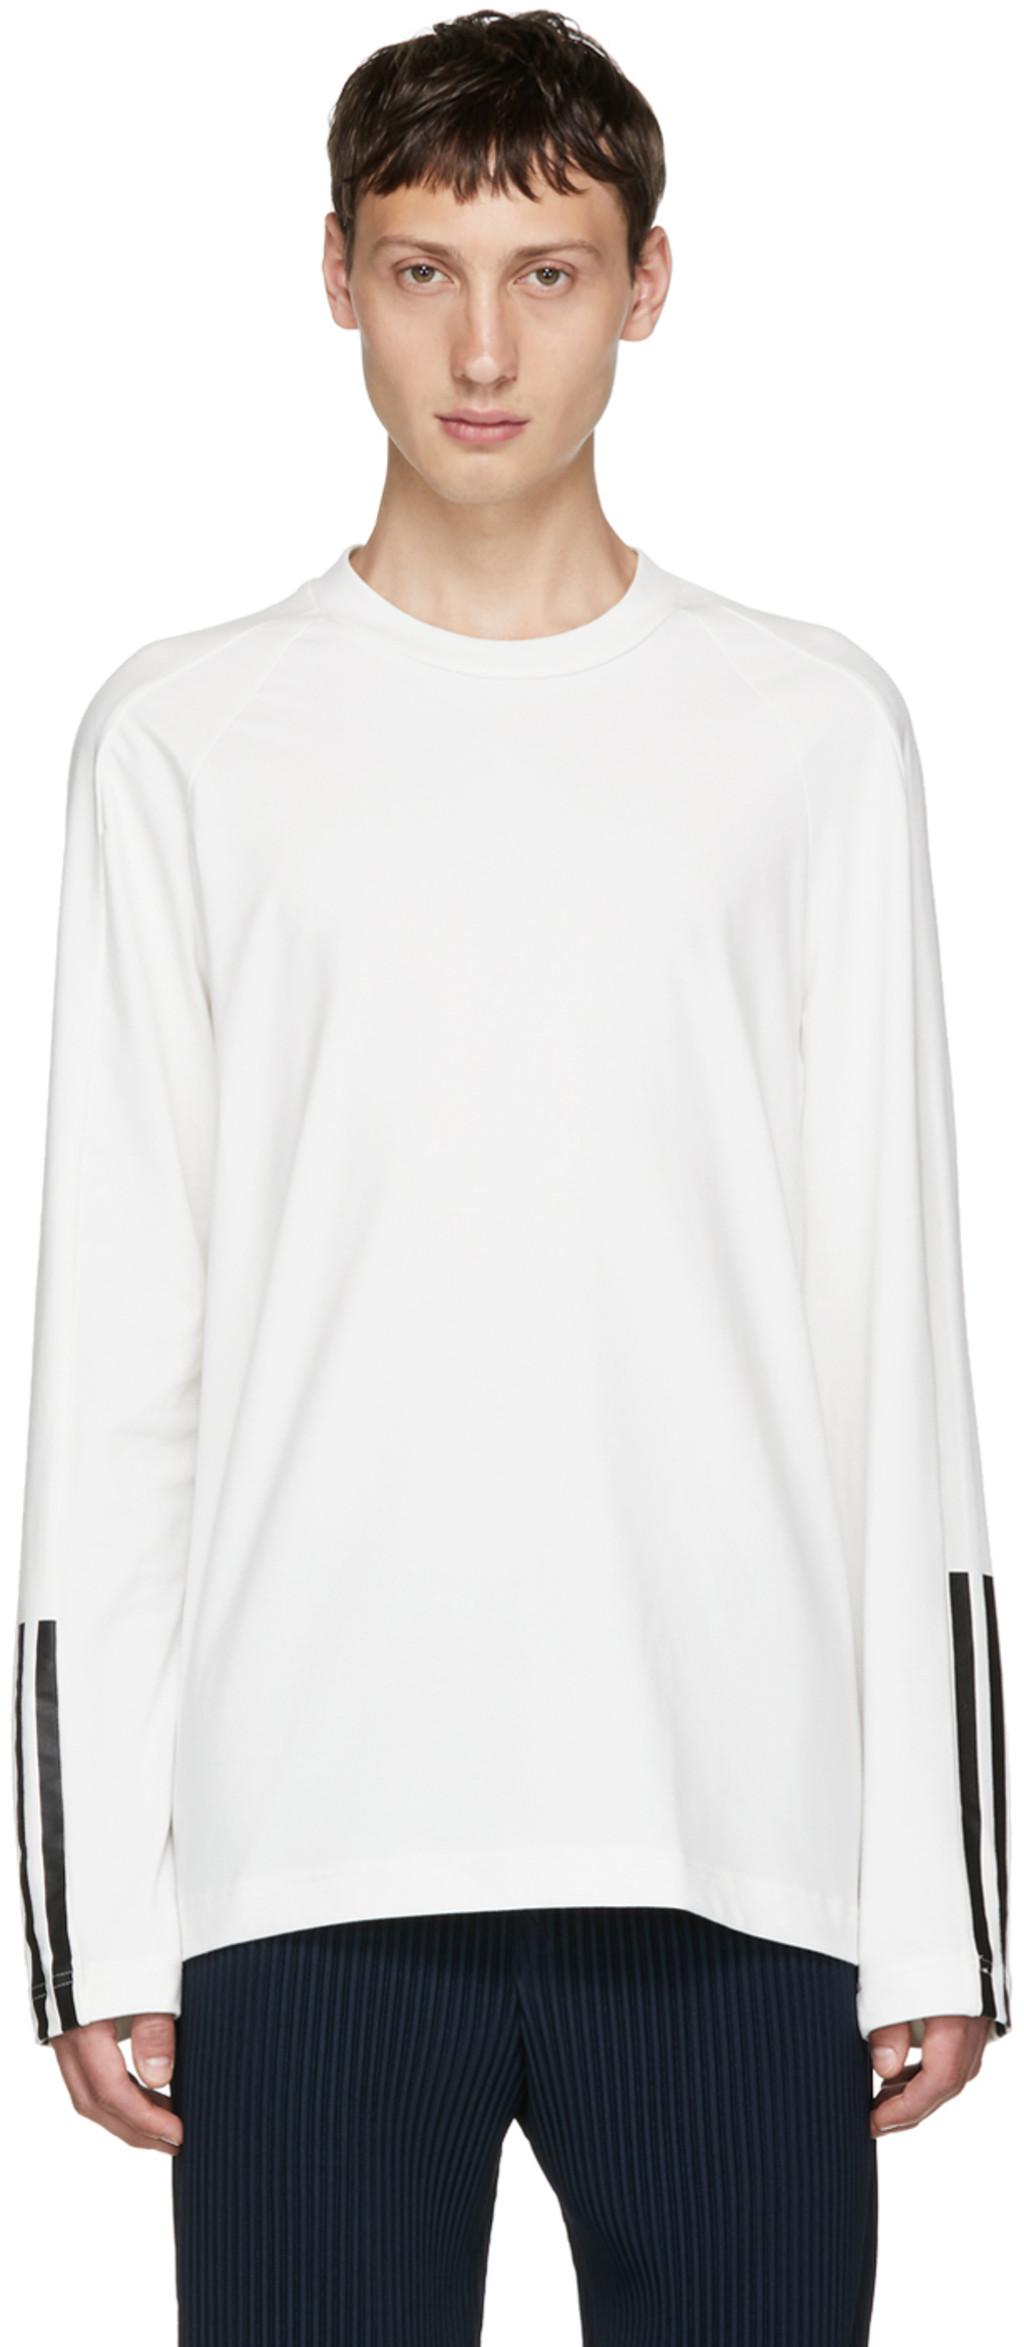 Outlet Best Very Cheap Online Indigo James Harden Satin T-Shirt Yohji Yamamoto Discount New Styles iDsPtm